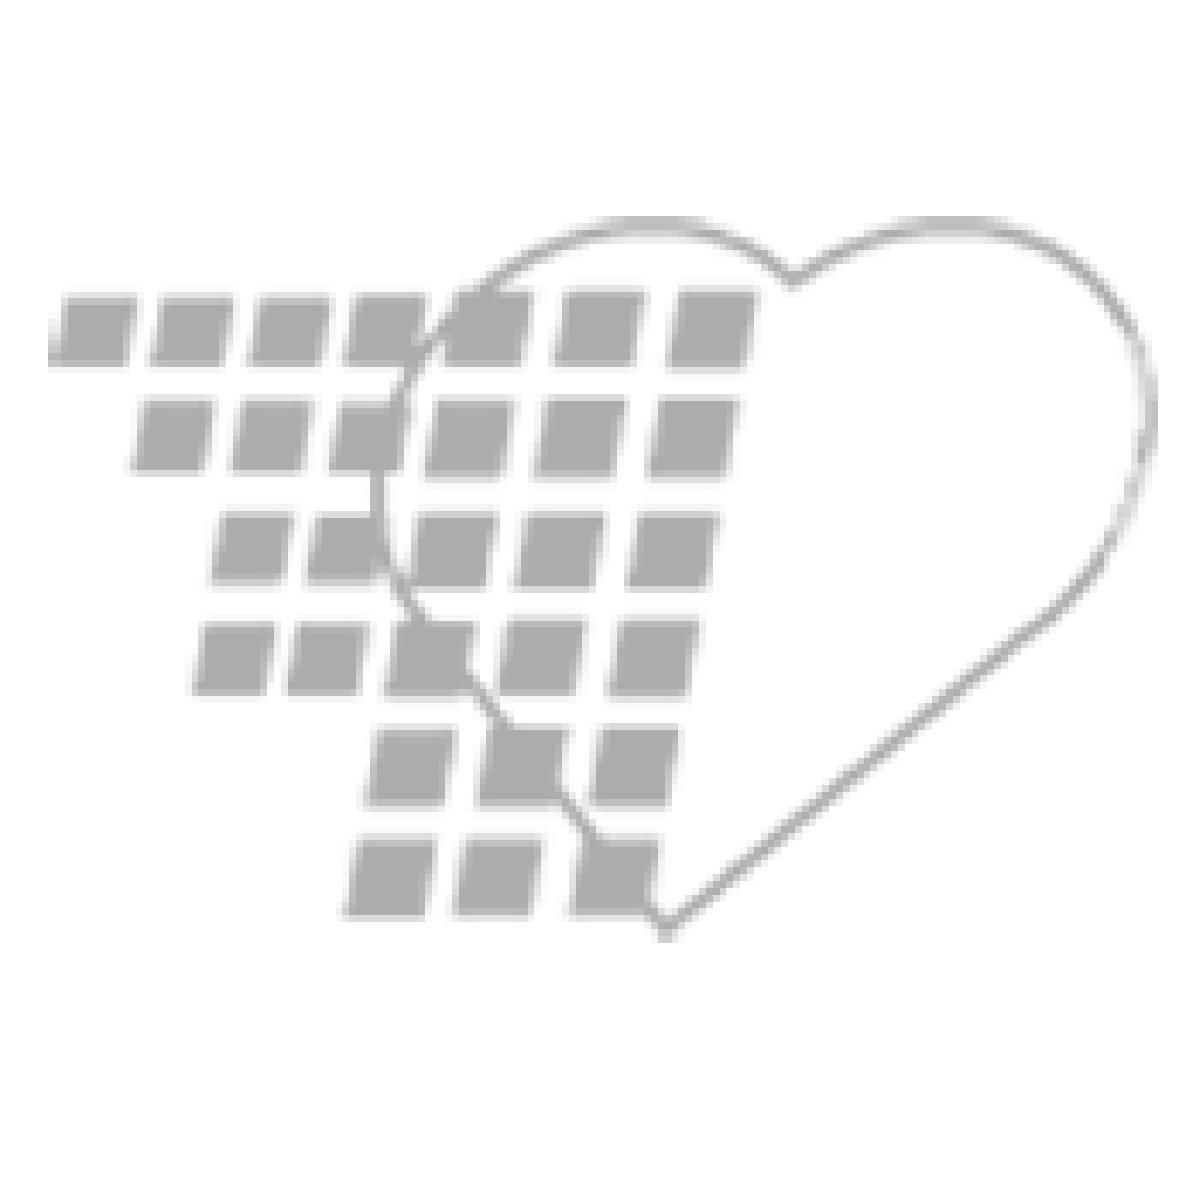 03-04-1905 PURELL™ Advanced Instant Hand Sanitizer Foam 1200mL Refill for PURELL™ LTX-12™ Dispenser